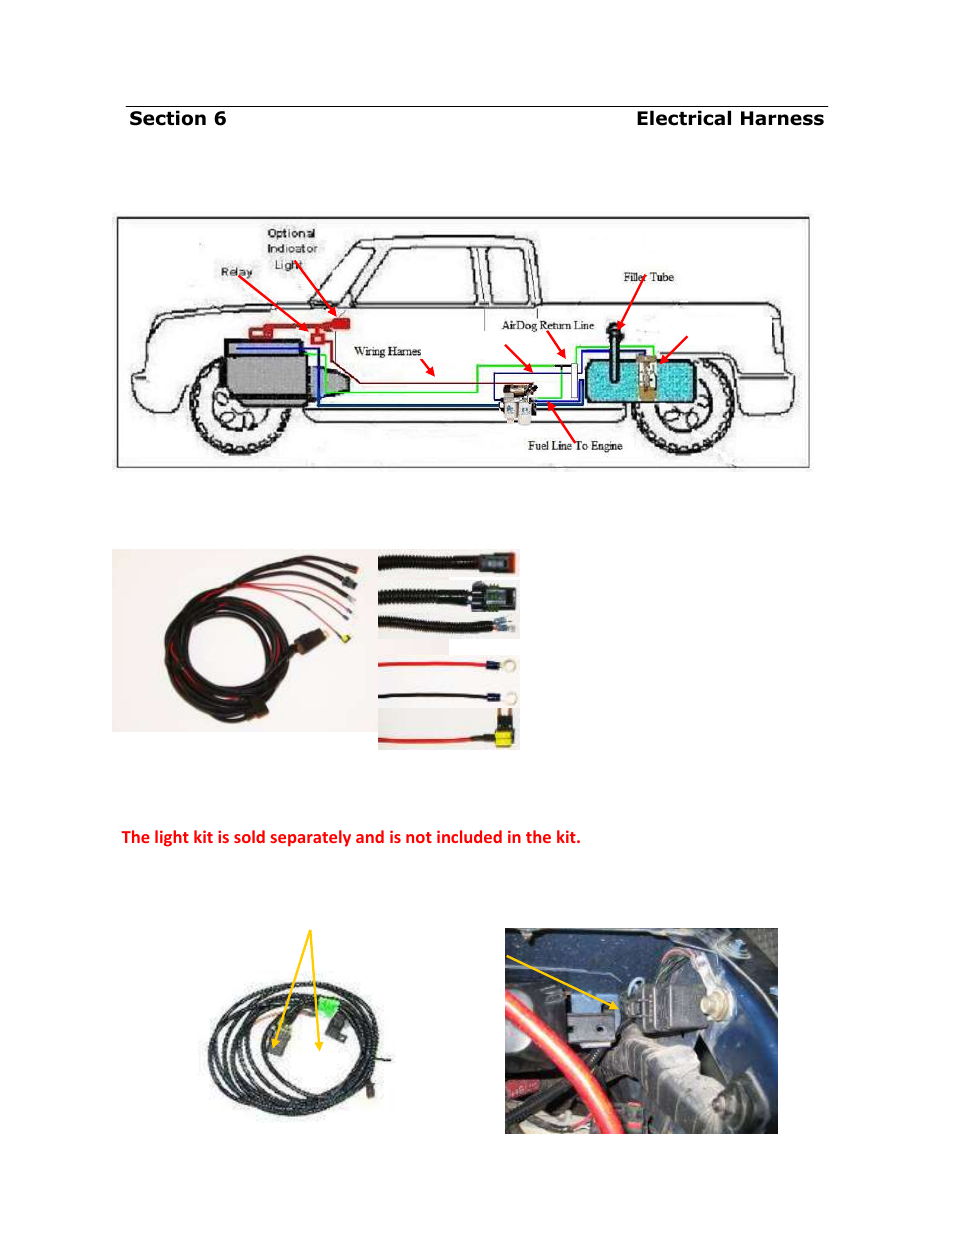 the airdog pureflow airdog airdog wiring diagram in red rh manualsdir com AirDog Fuel System Pressure Gauge AirDog 2 Return Fitting Dodge